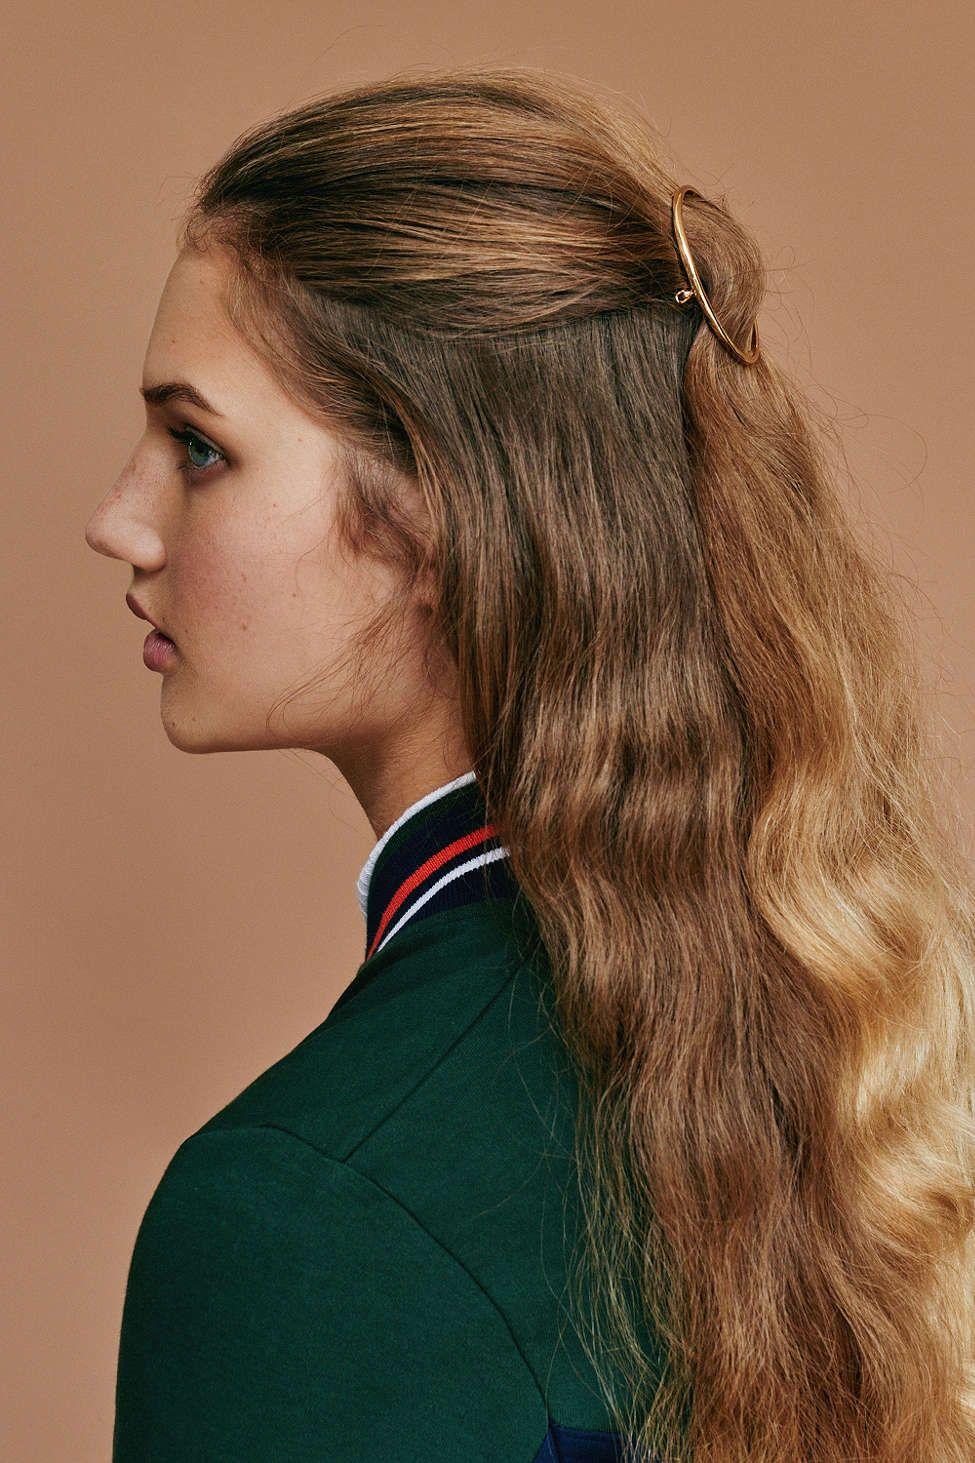 Margot hair pin s t y l e pinterest hair inspiration hair